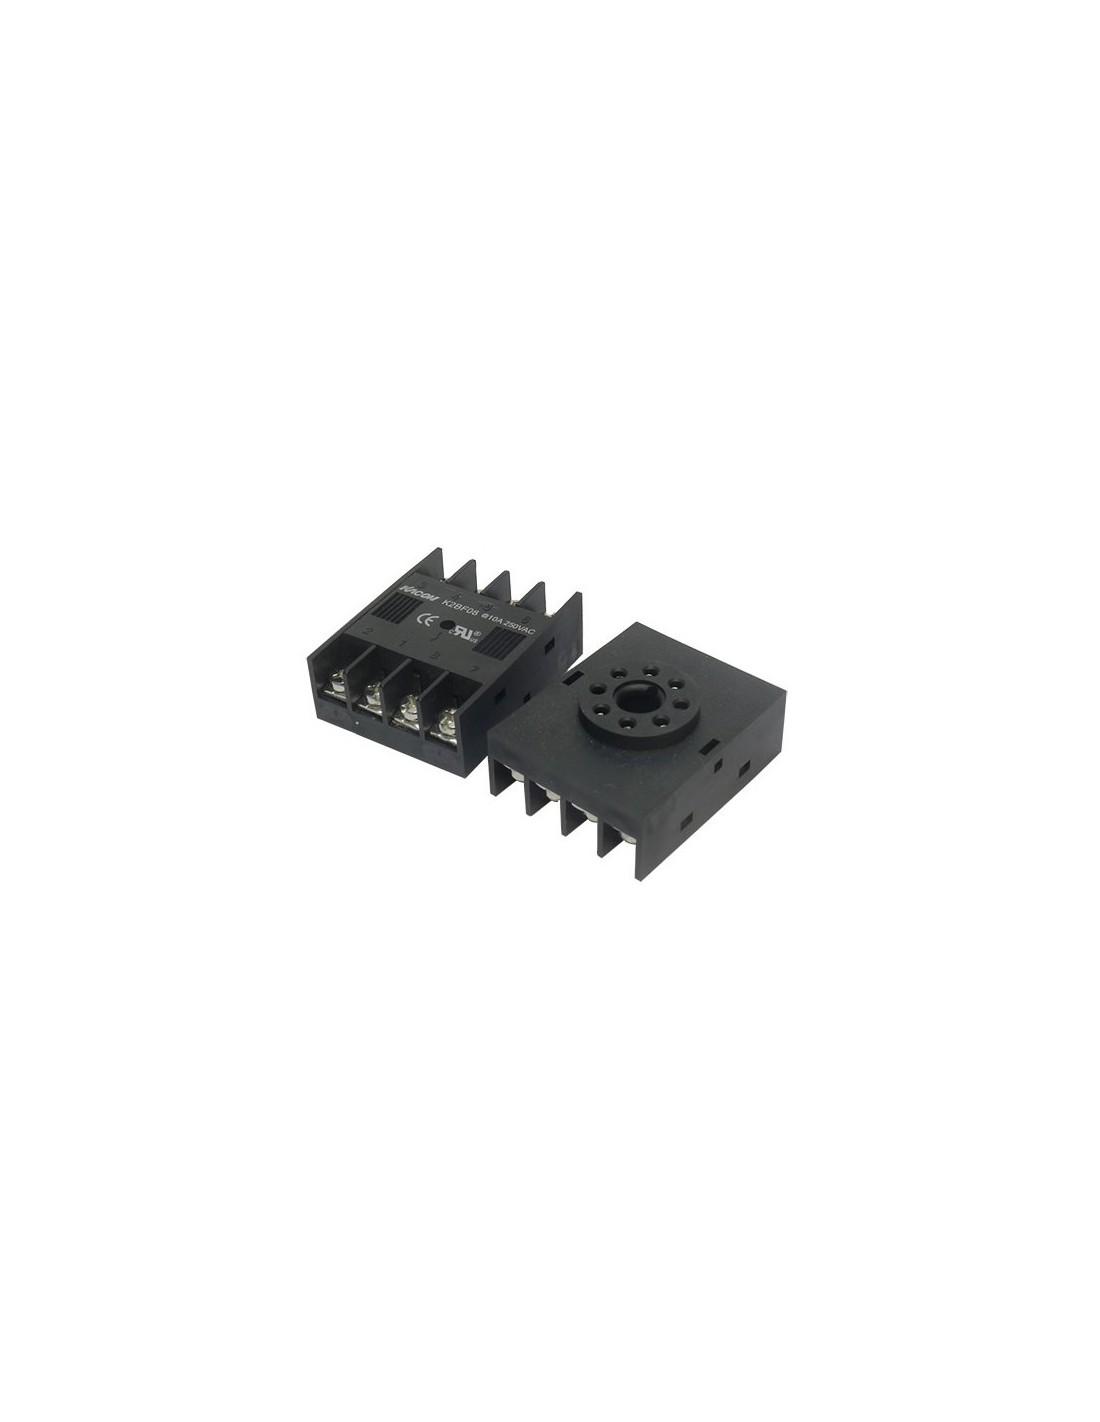 Omron E5cc Rx2asm 800 Temperature Controller Sales Price